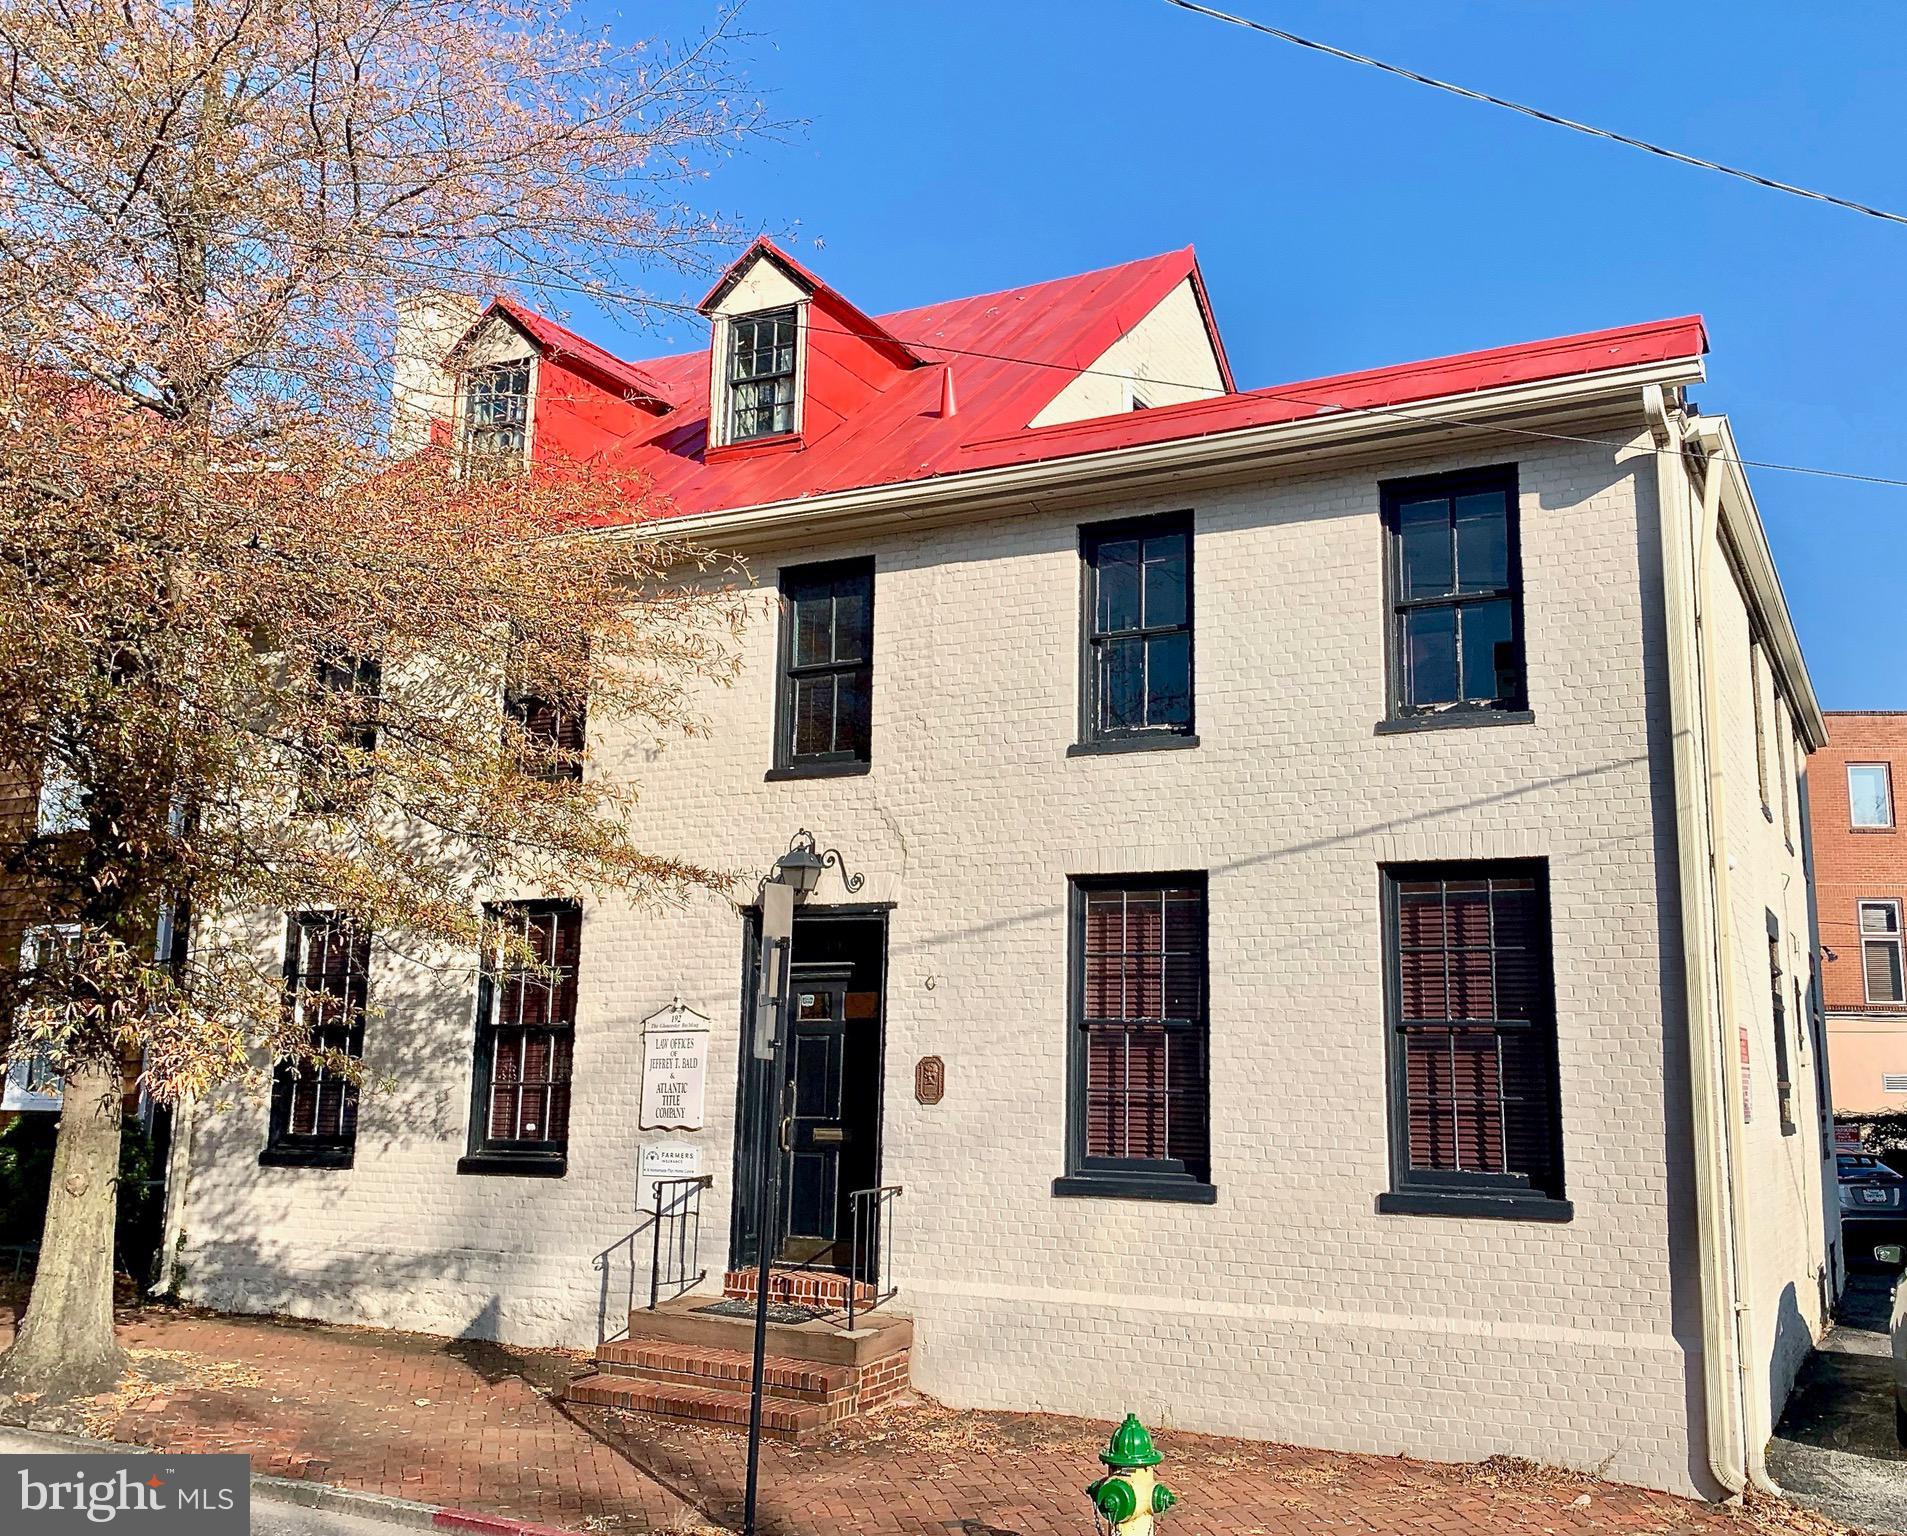 192 Duke Of Gloucester St, Annapolis, MD, 21401